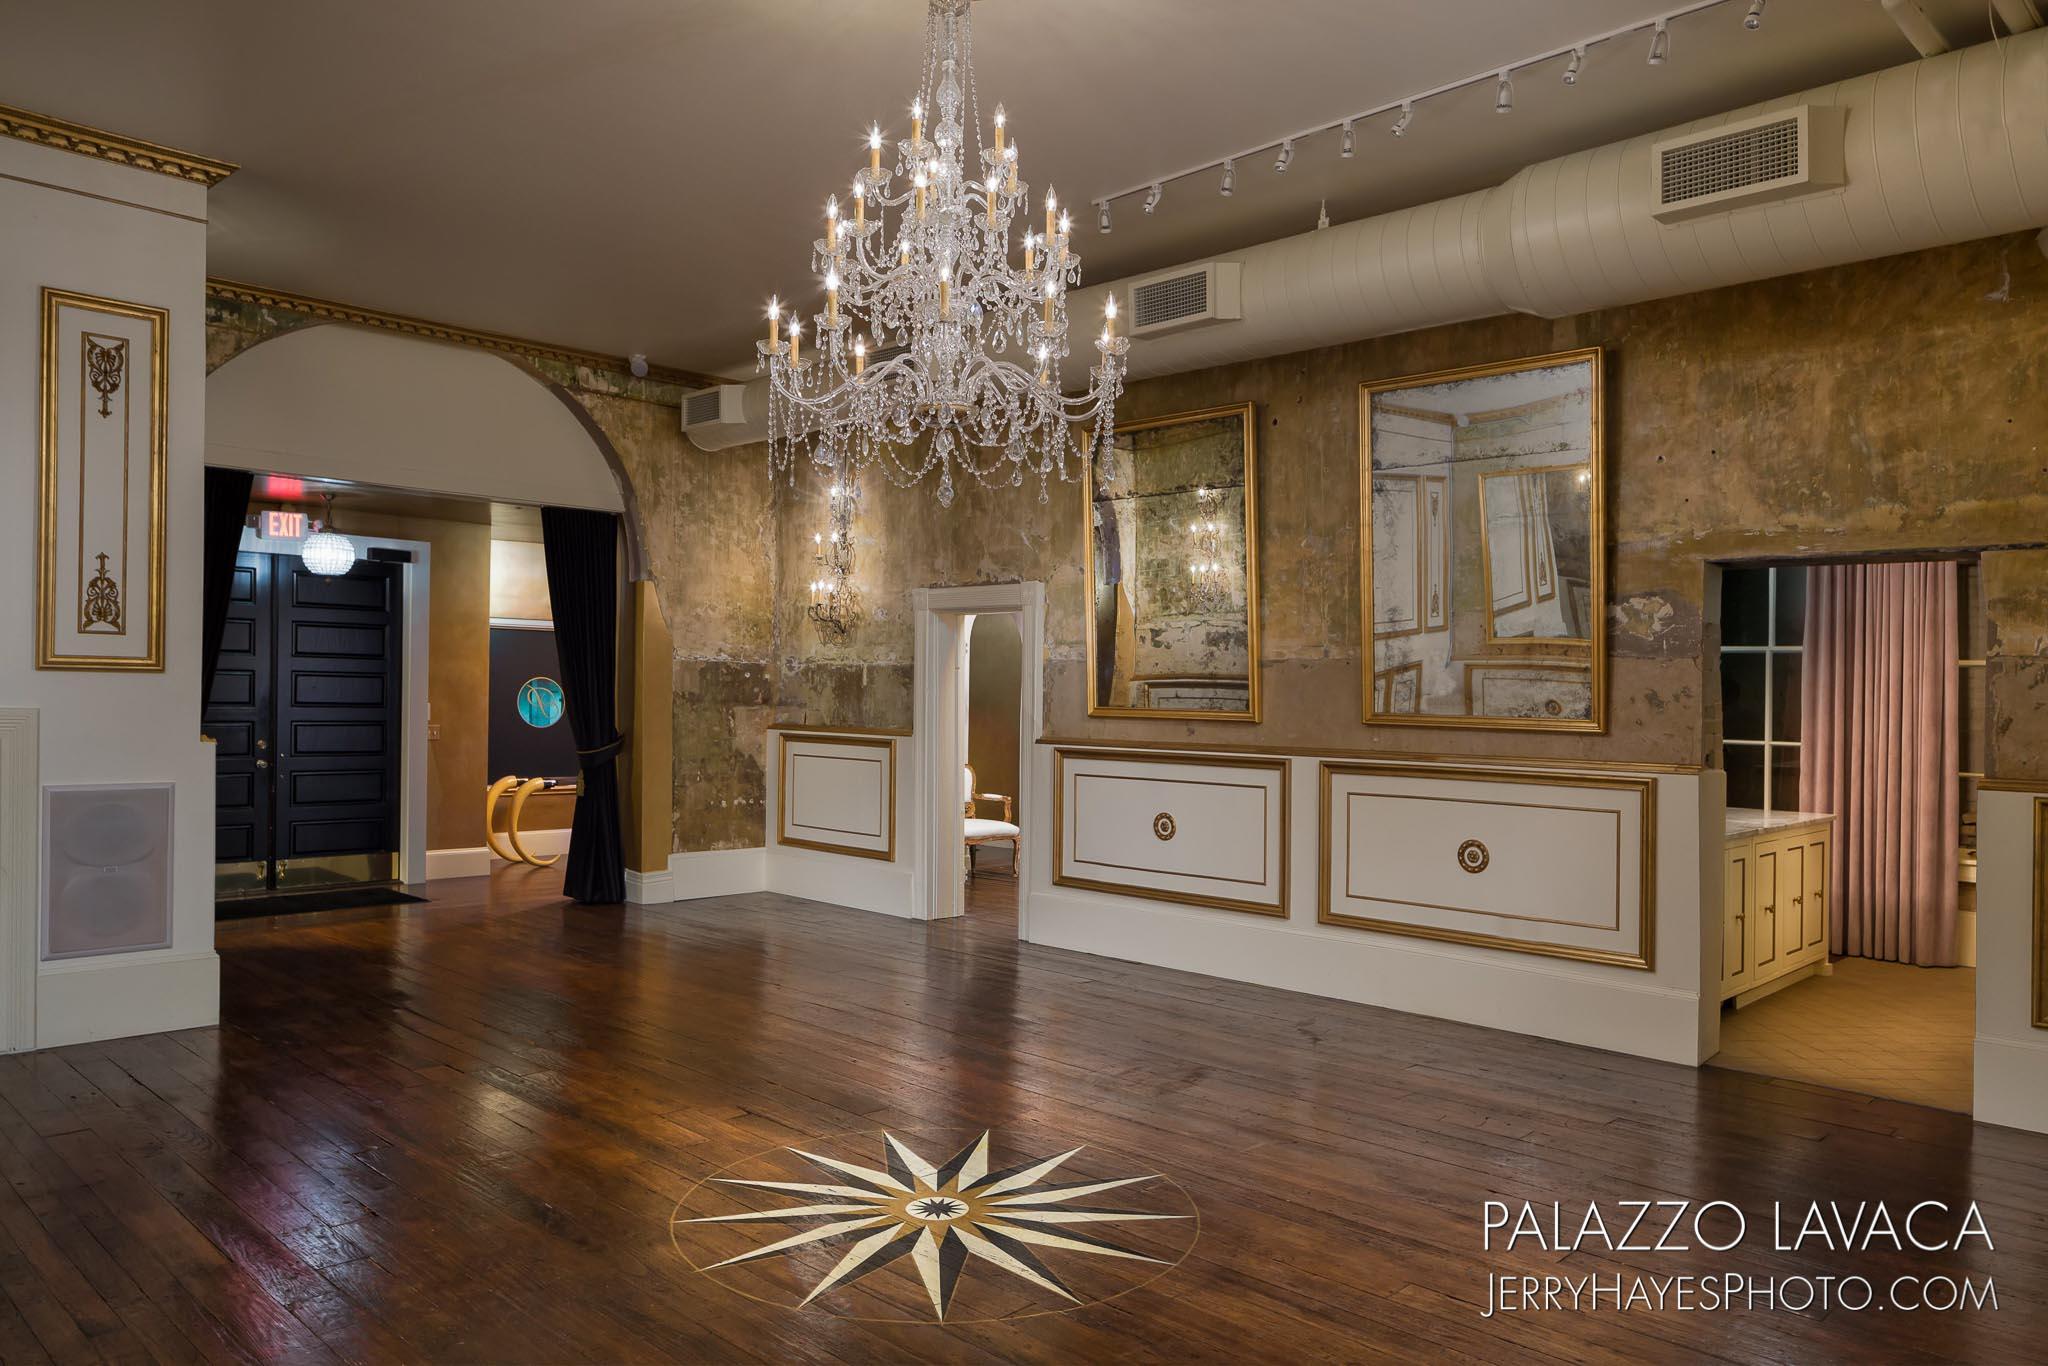 PalazzoLavacaJuly2016-12-4.jpg